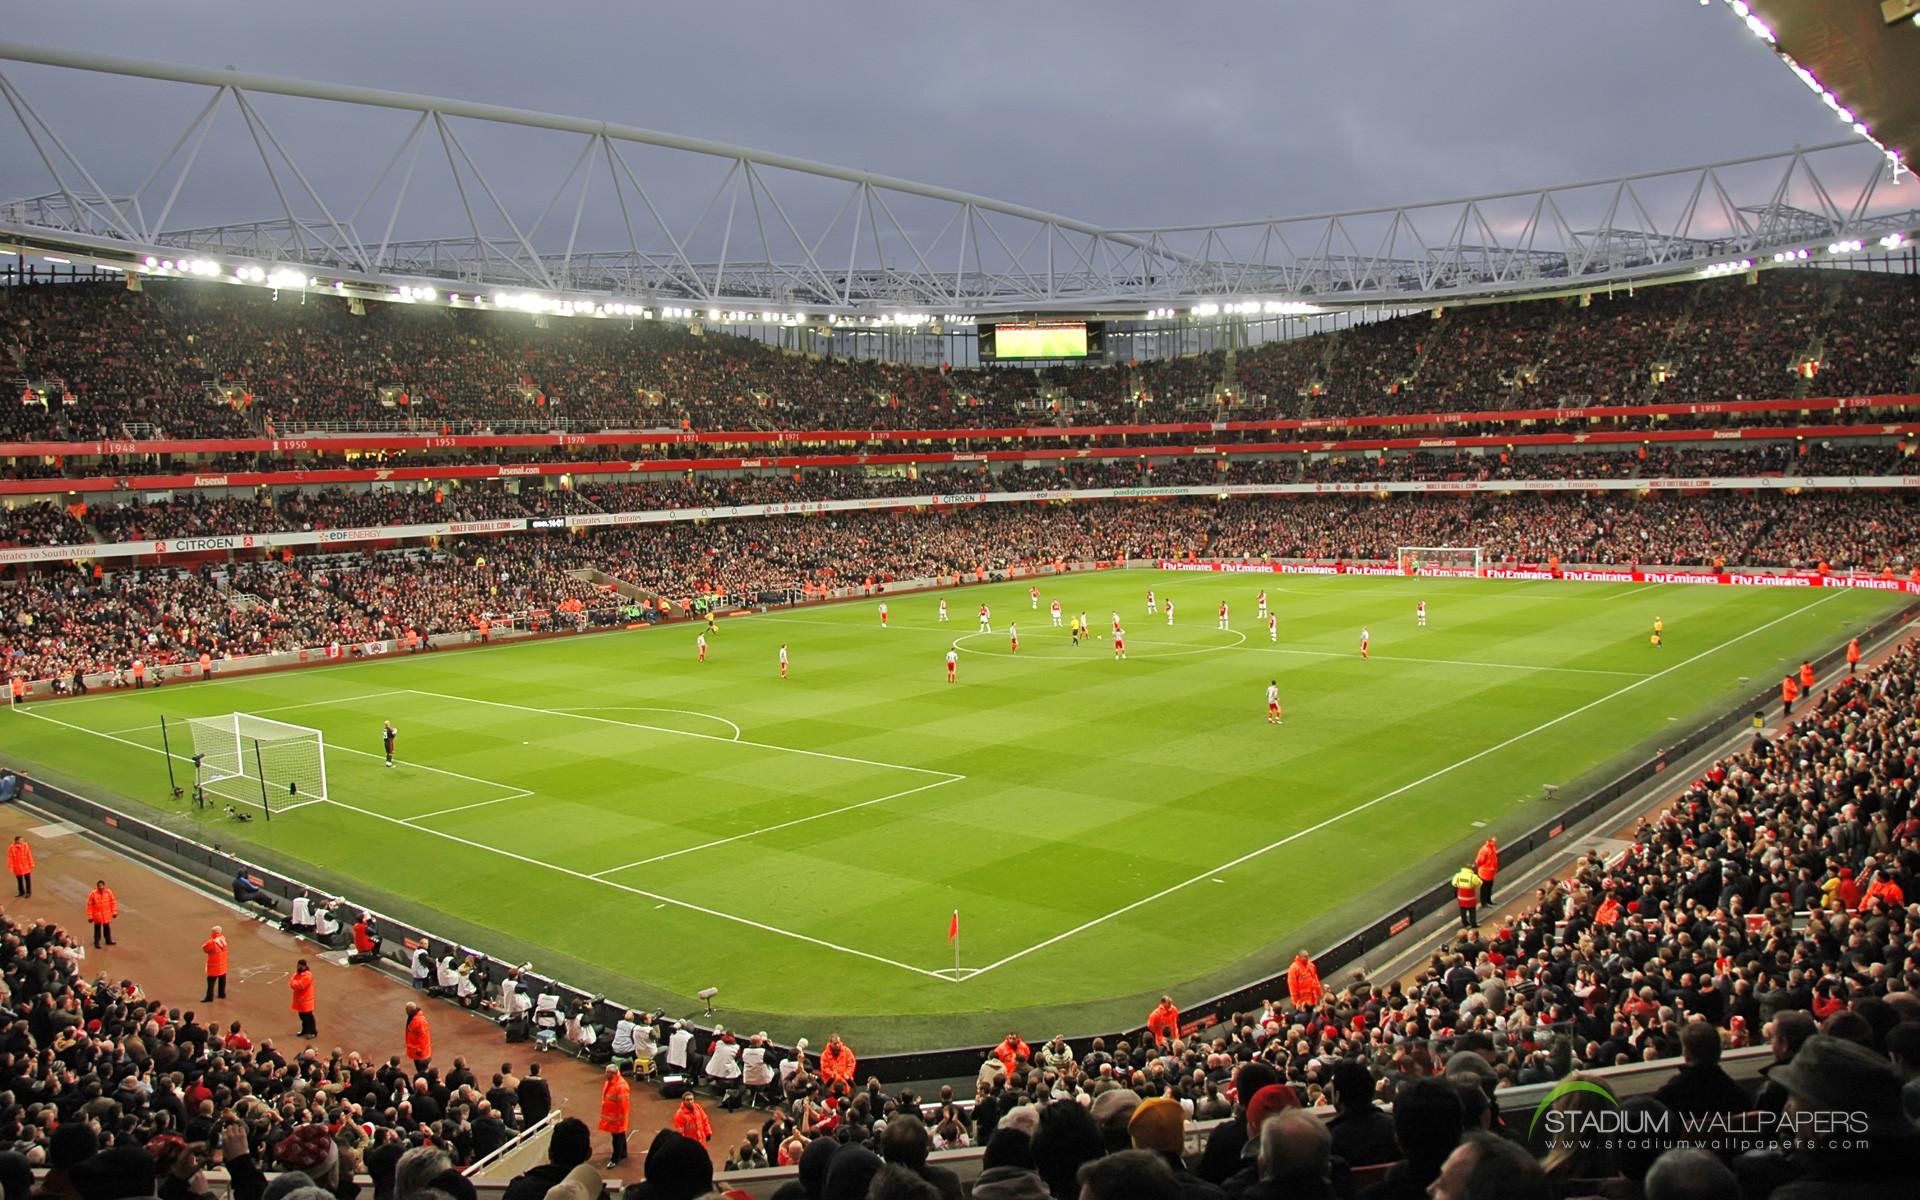 HD Soccer Stadium Wallpaper (65+ Images